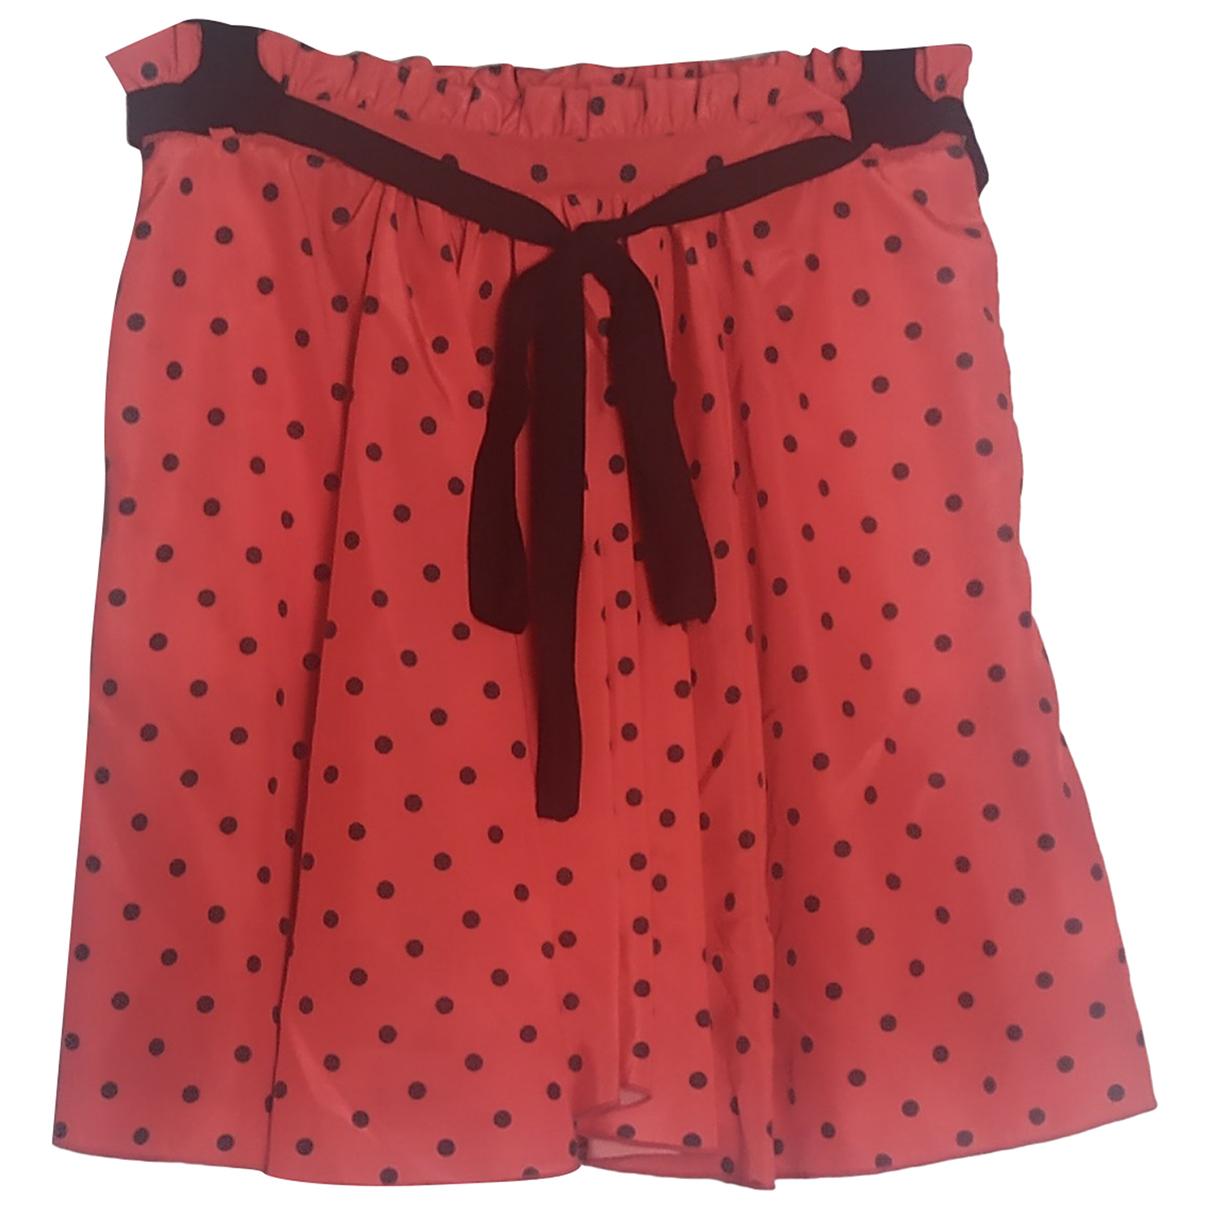 Msgm N Red skirt for Women 42 IT